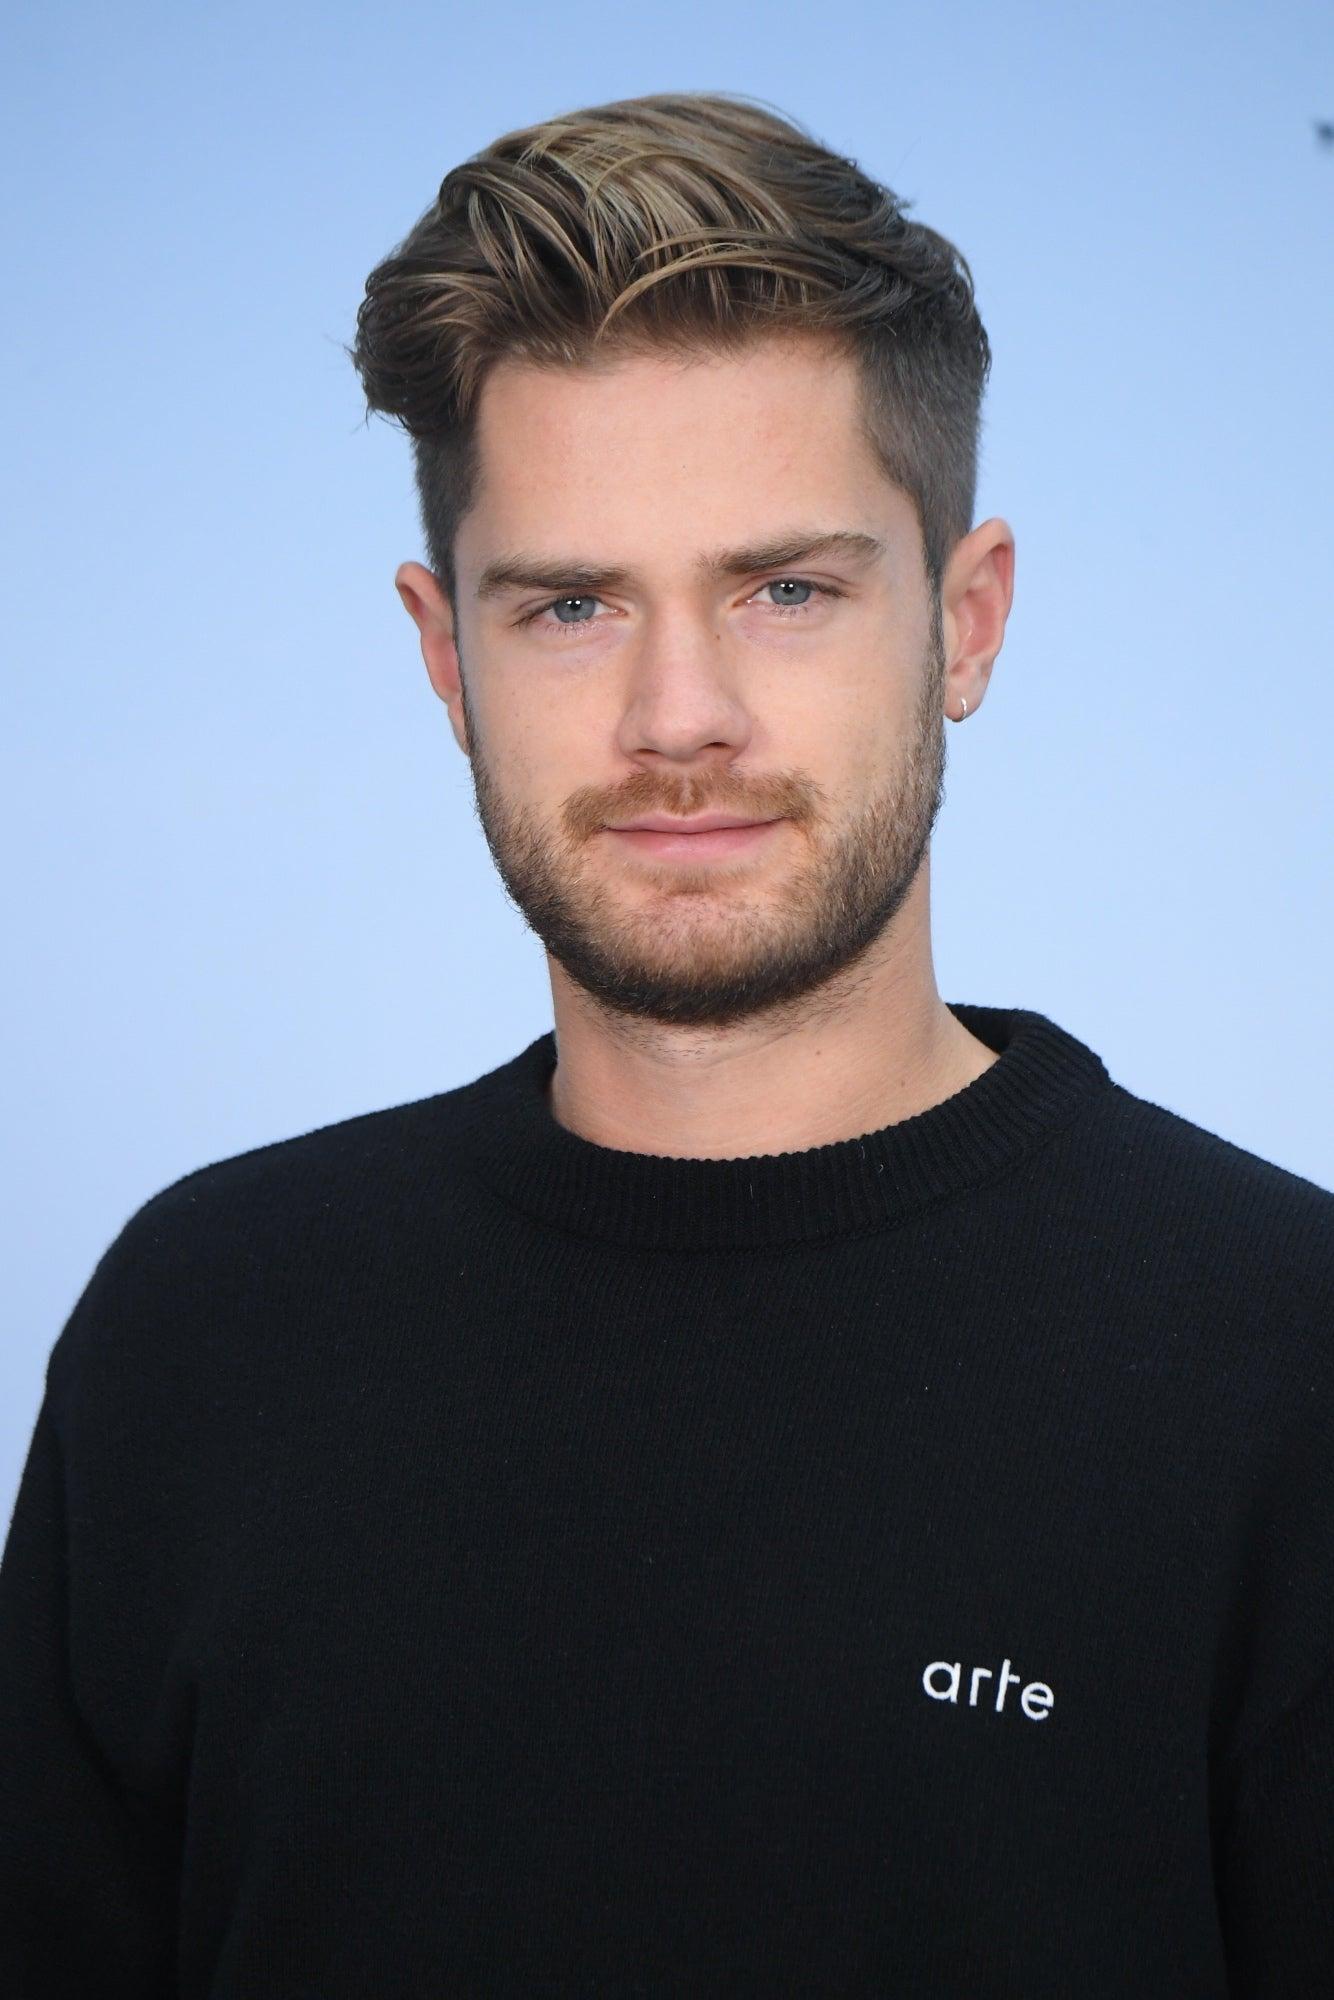 Filmmaker Lukas Dhont